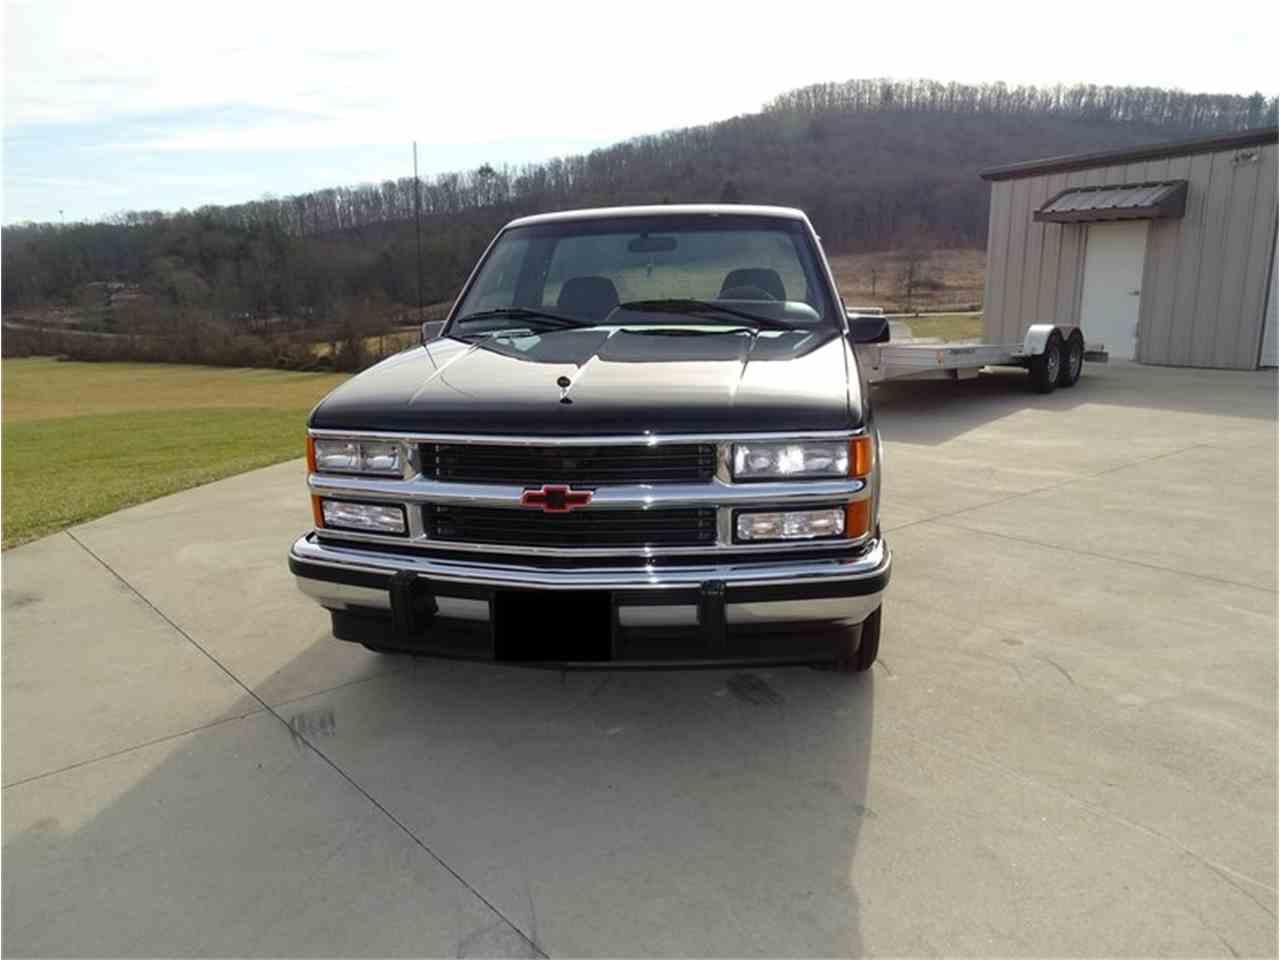 Silverado 96 chevrolet silverado : 1996 Chevrolet Silverado for Sale | ClassicCars.com | CC-1060569